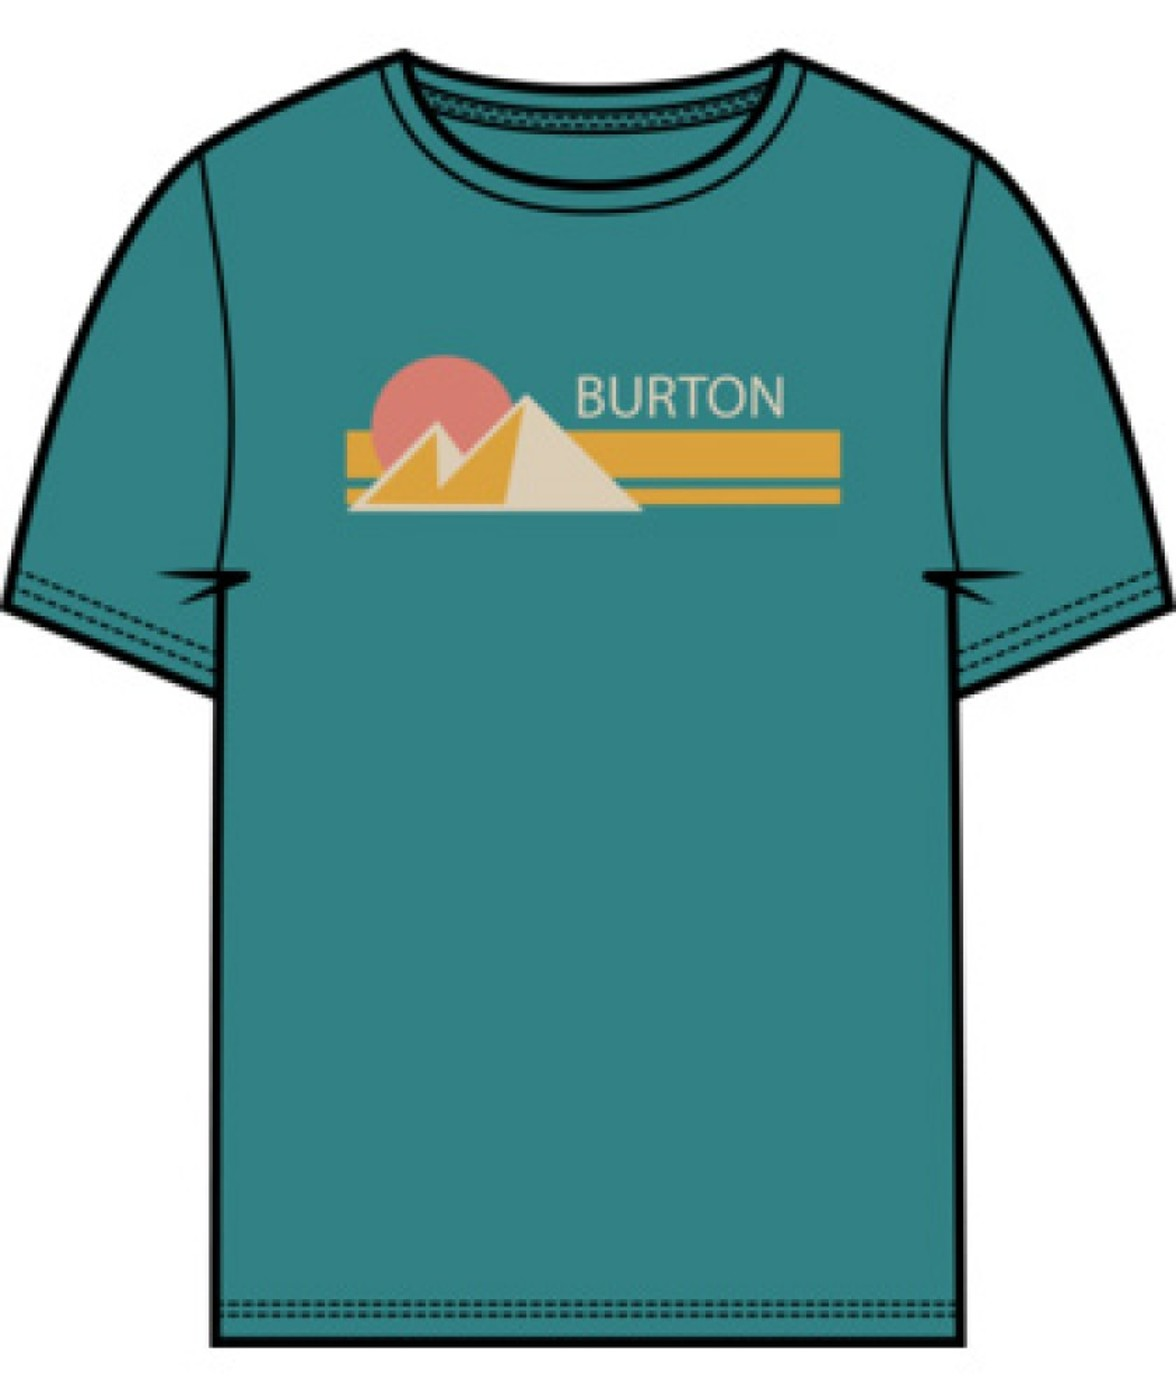 BURTON Ashmore SS T-Shirt - Damen